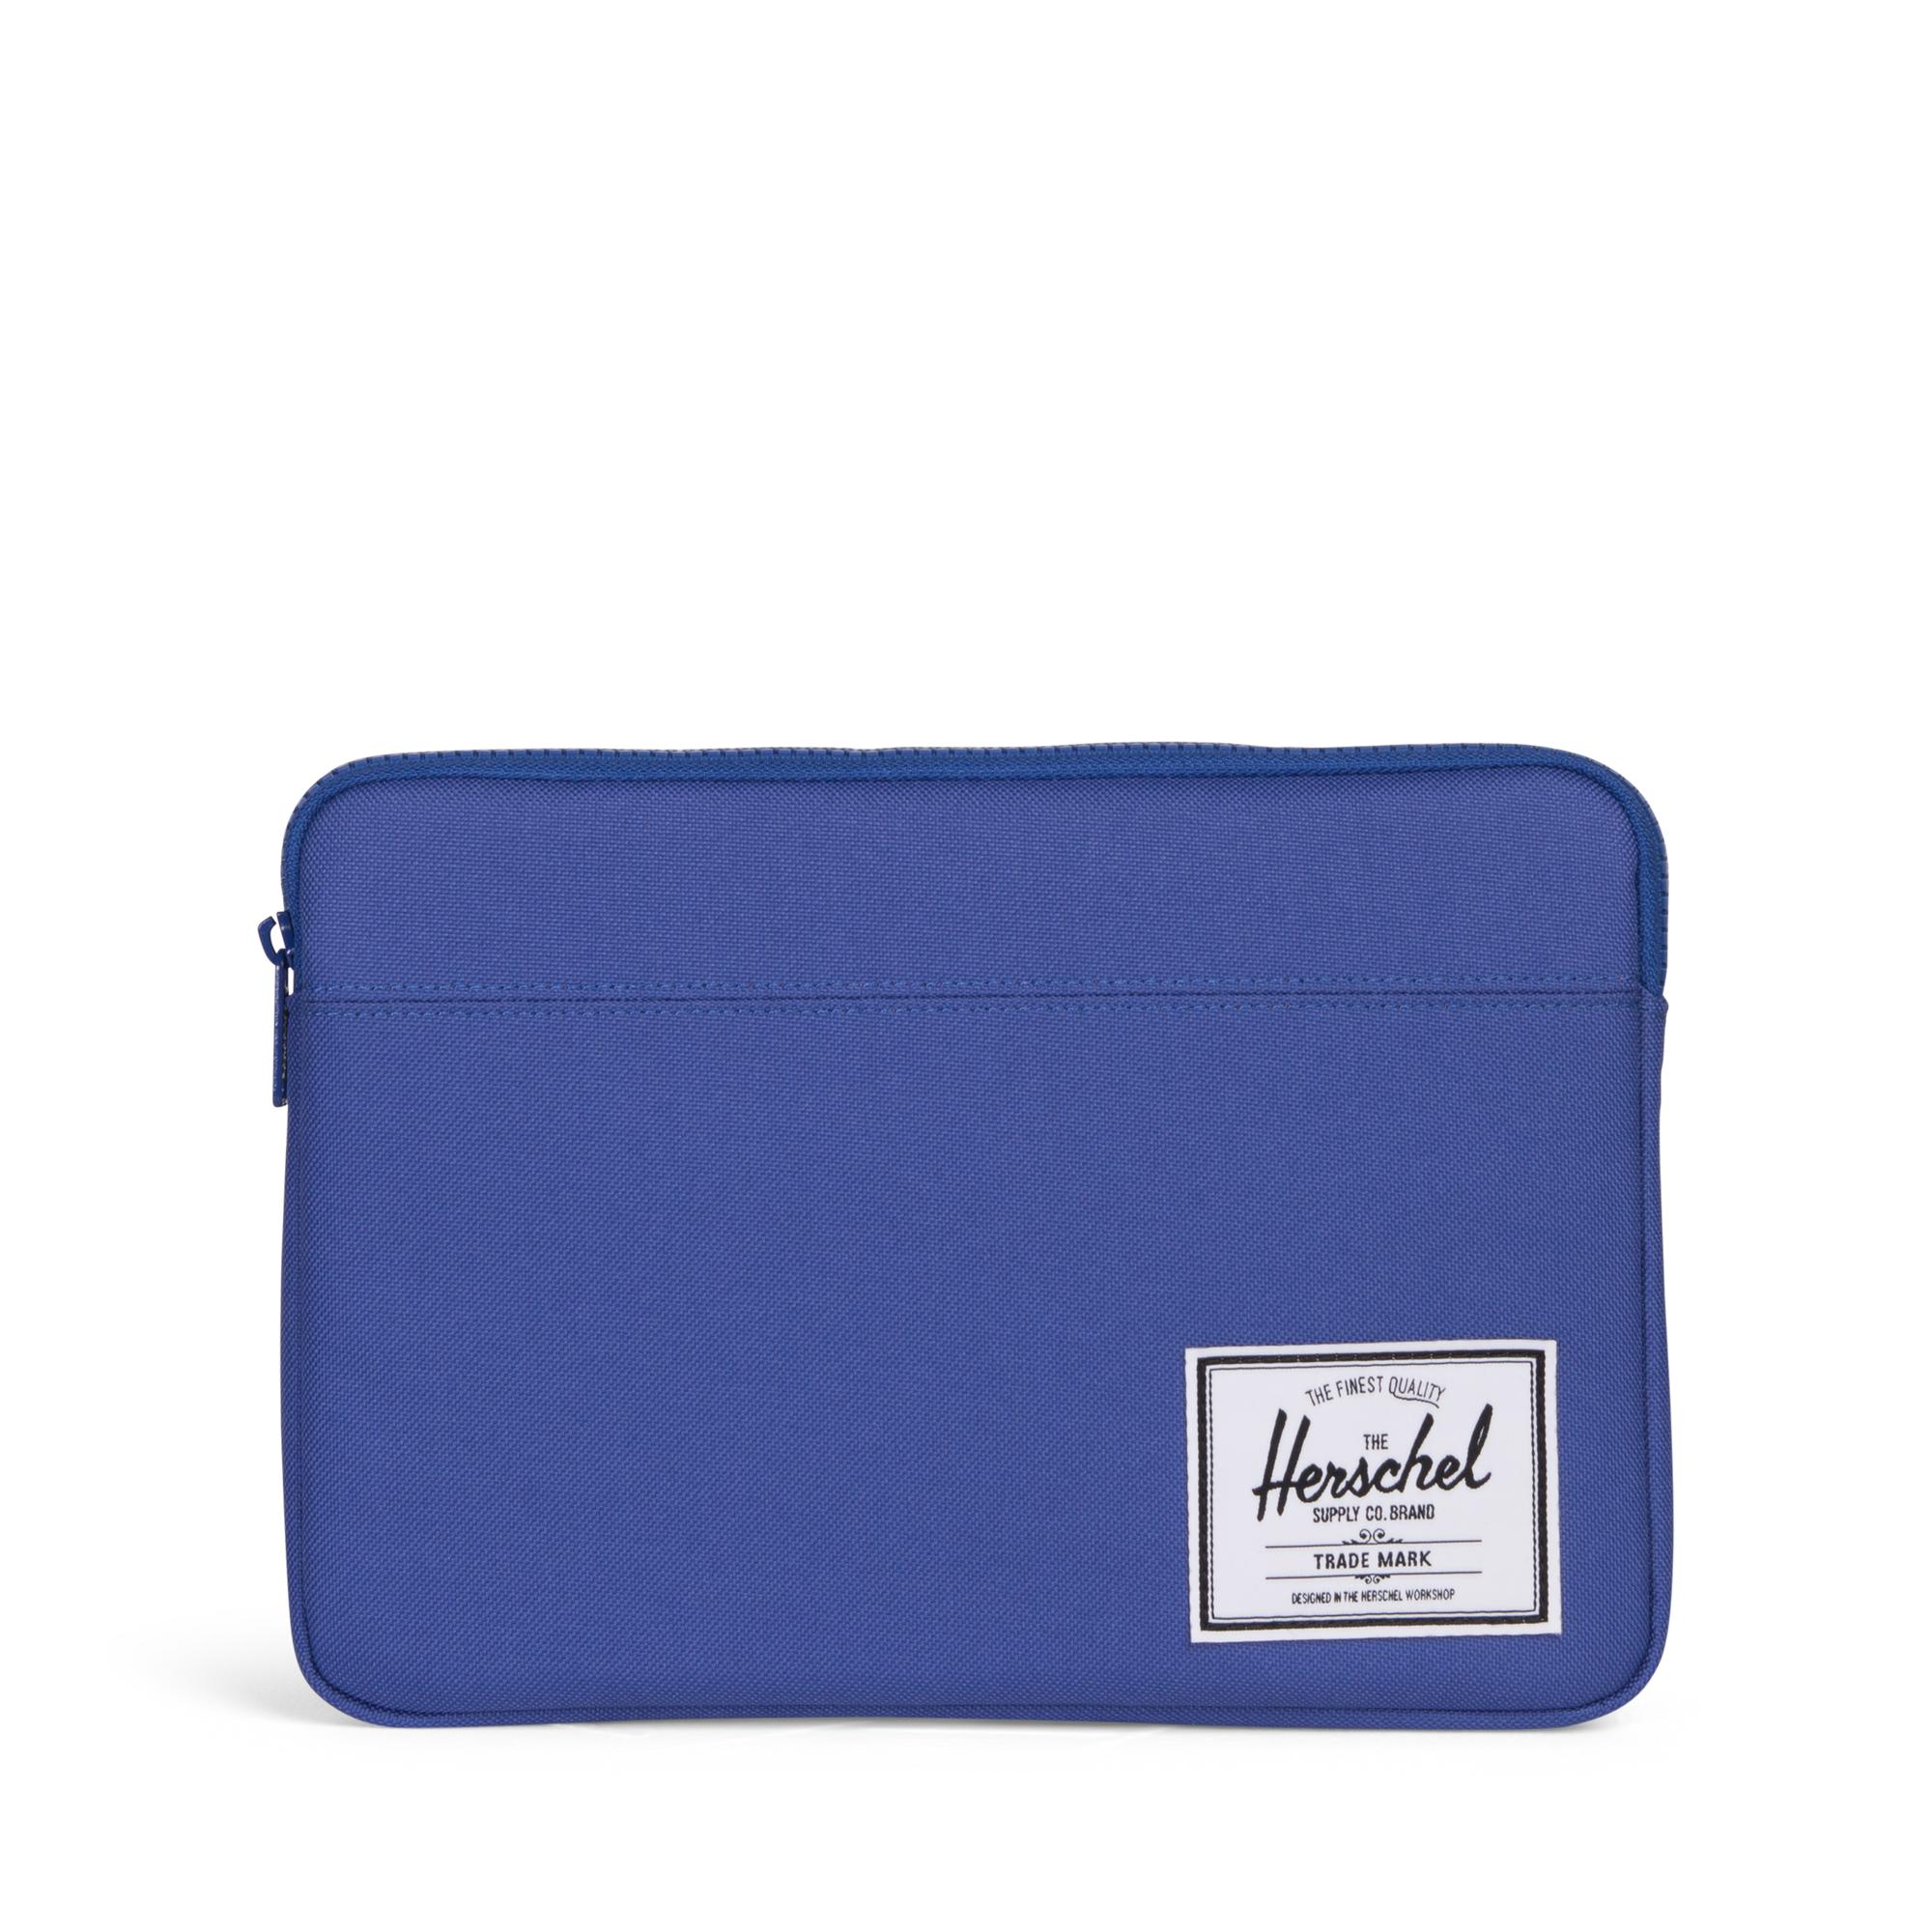 Jual Tas Laptop Soft Sleeve Case Neoprene Double Pocket Macbook Source · Laptop Sleeves Laptop Cases